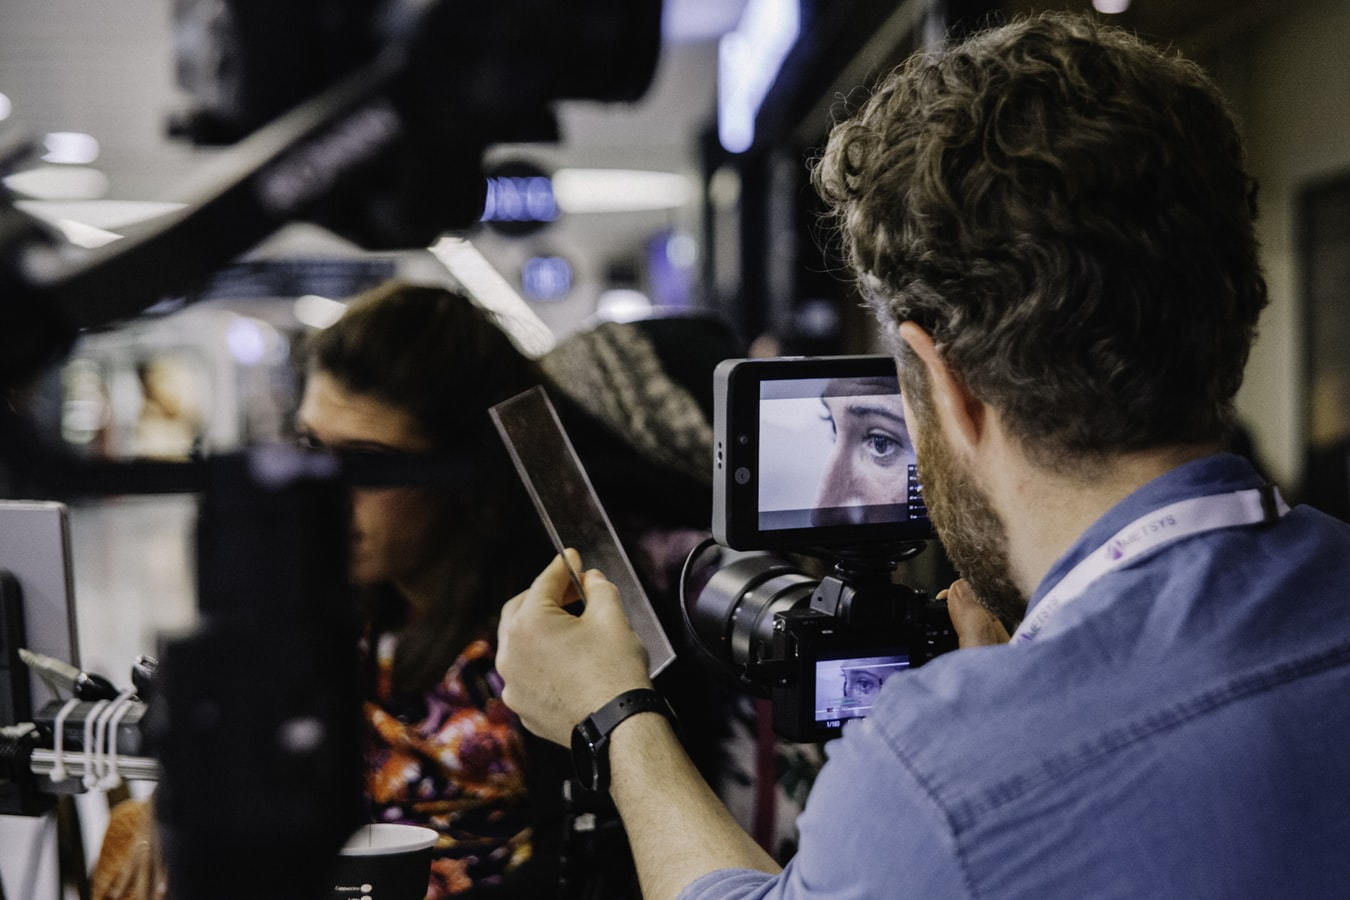 Photographe manipulant une Caméra